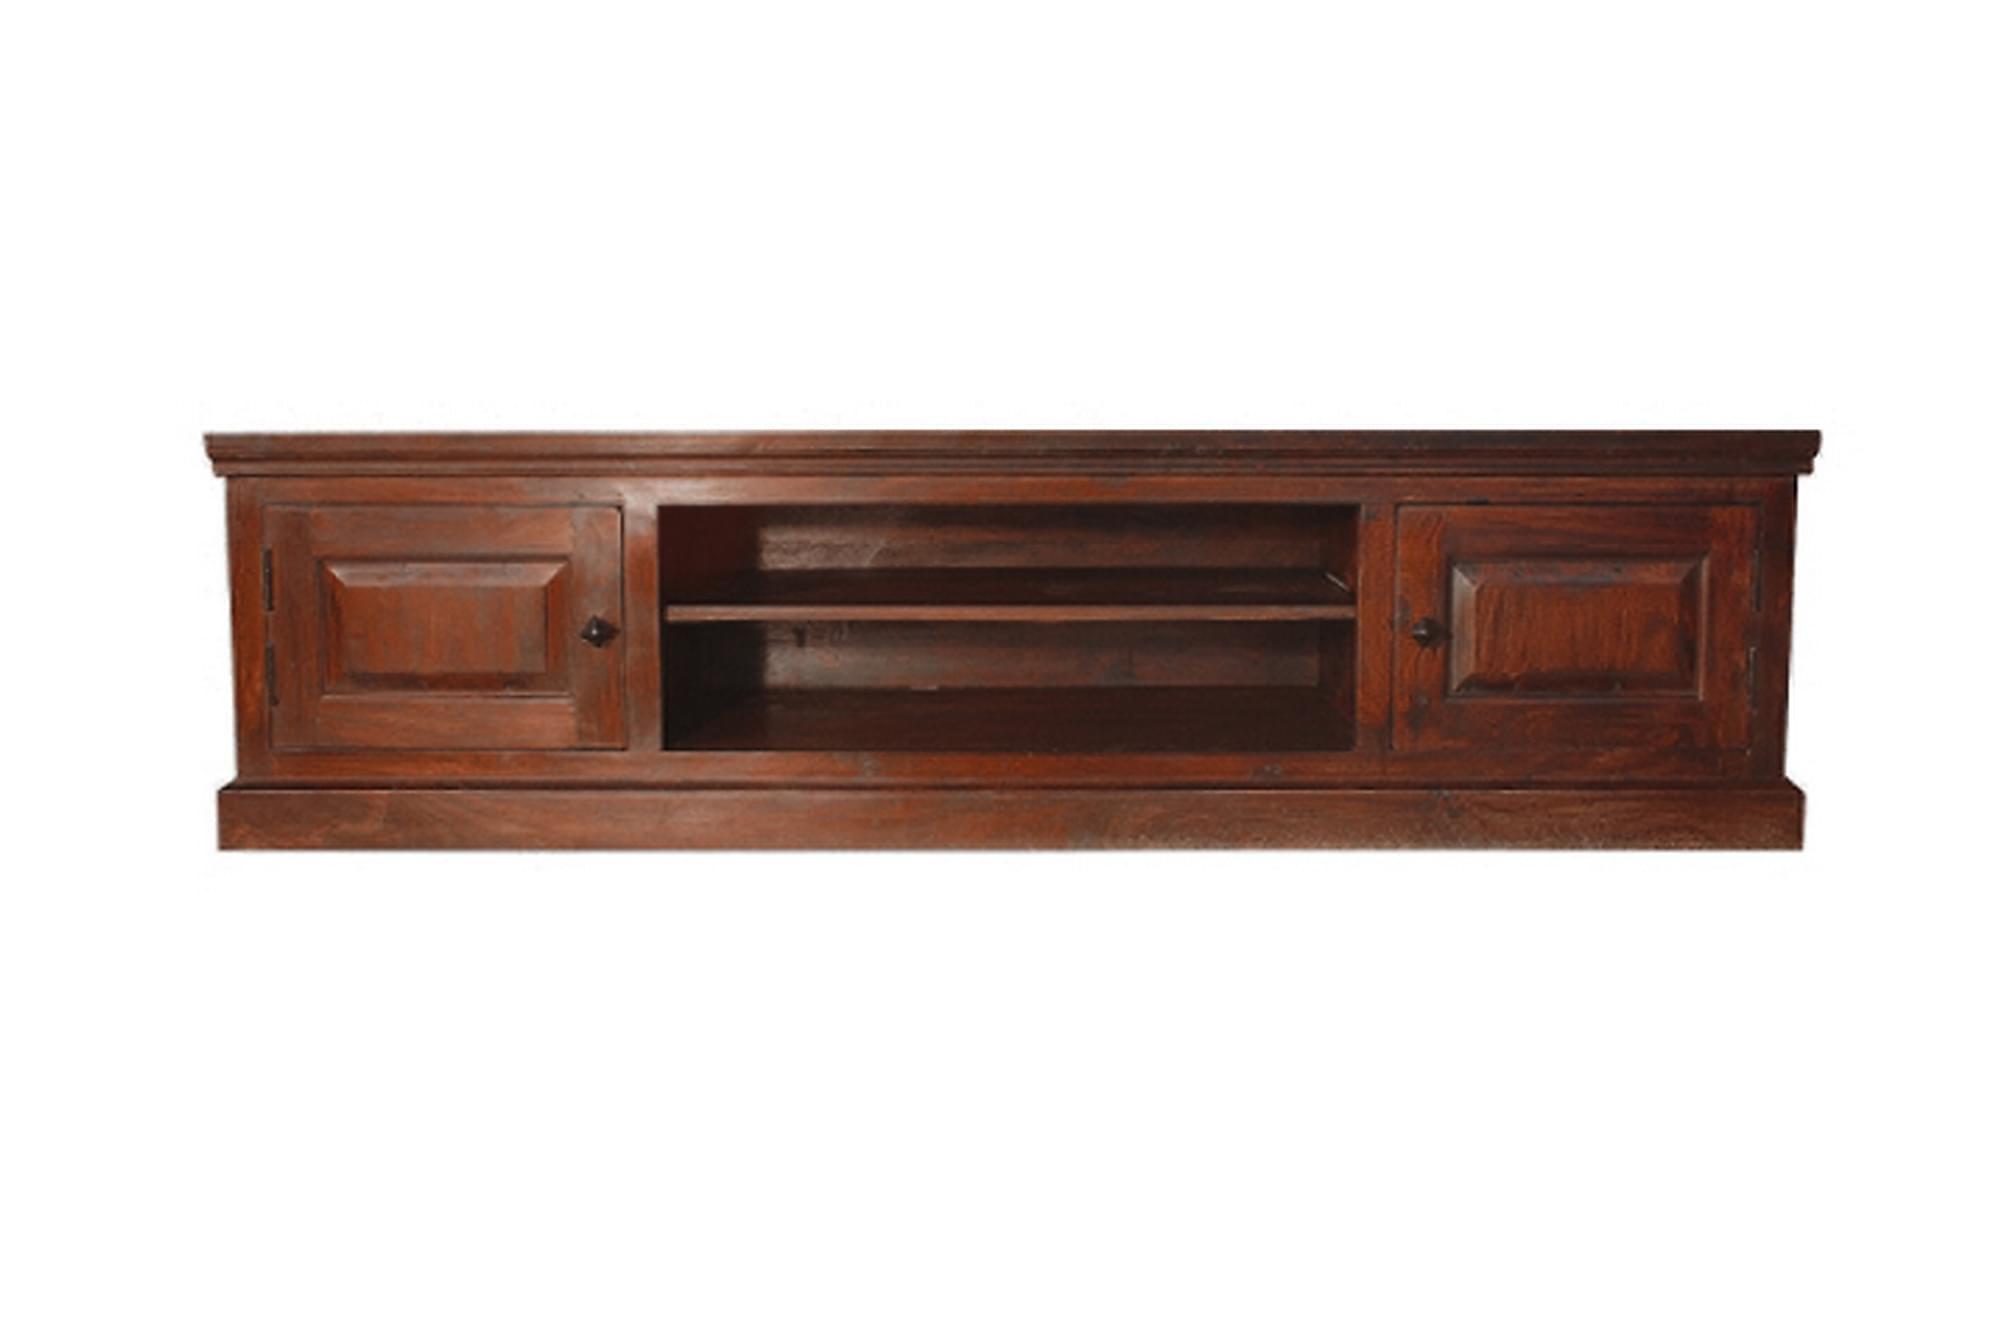 india tv b nk 165 m rkbrun tv b nkar f rvaring. Black Bedroom Furniture Sets. Home Design Ideas